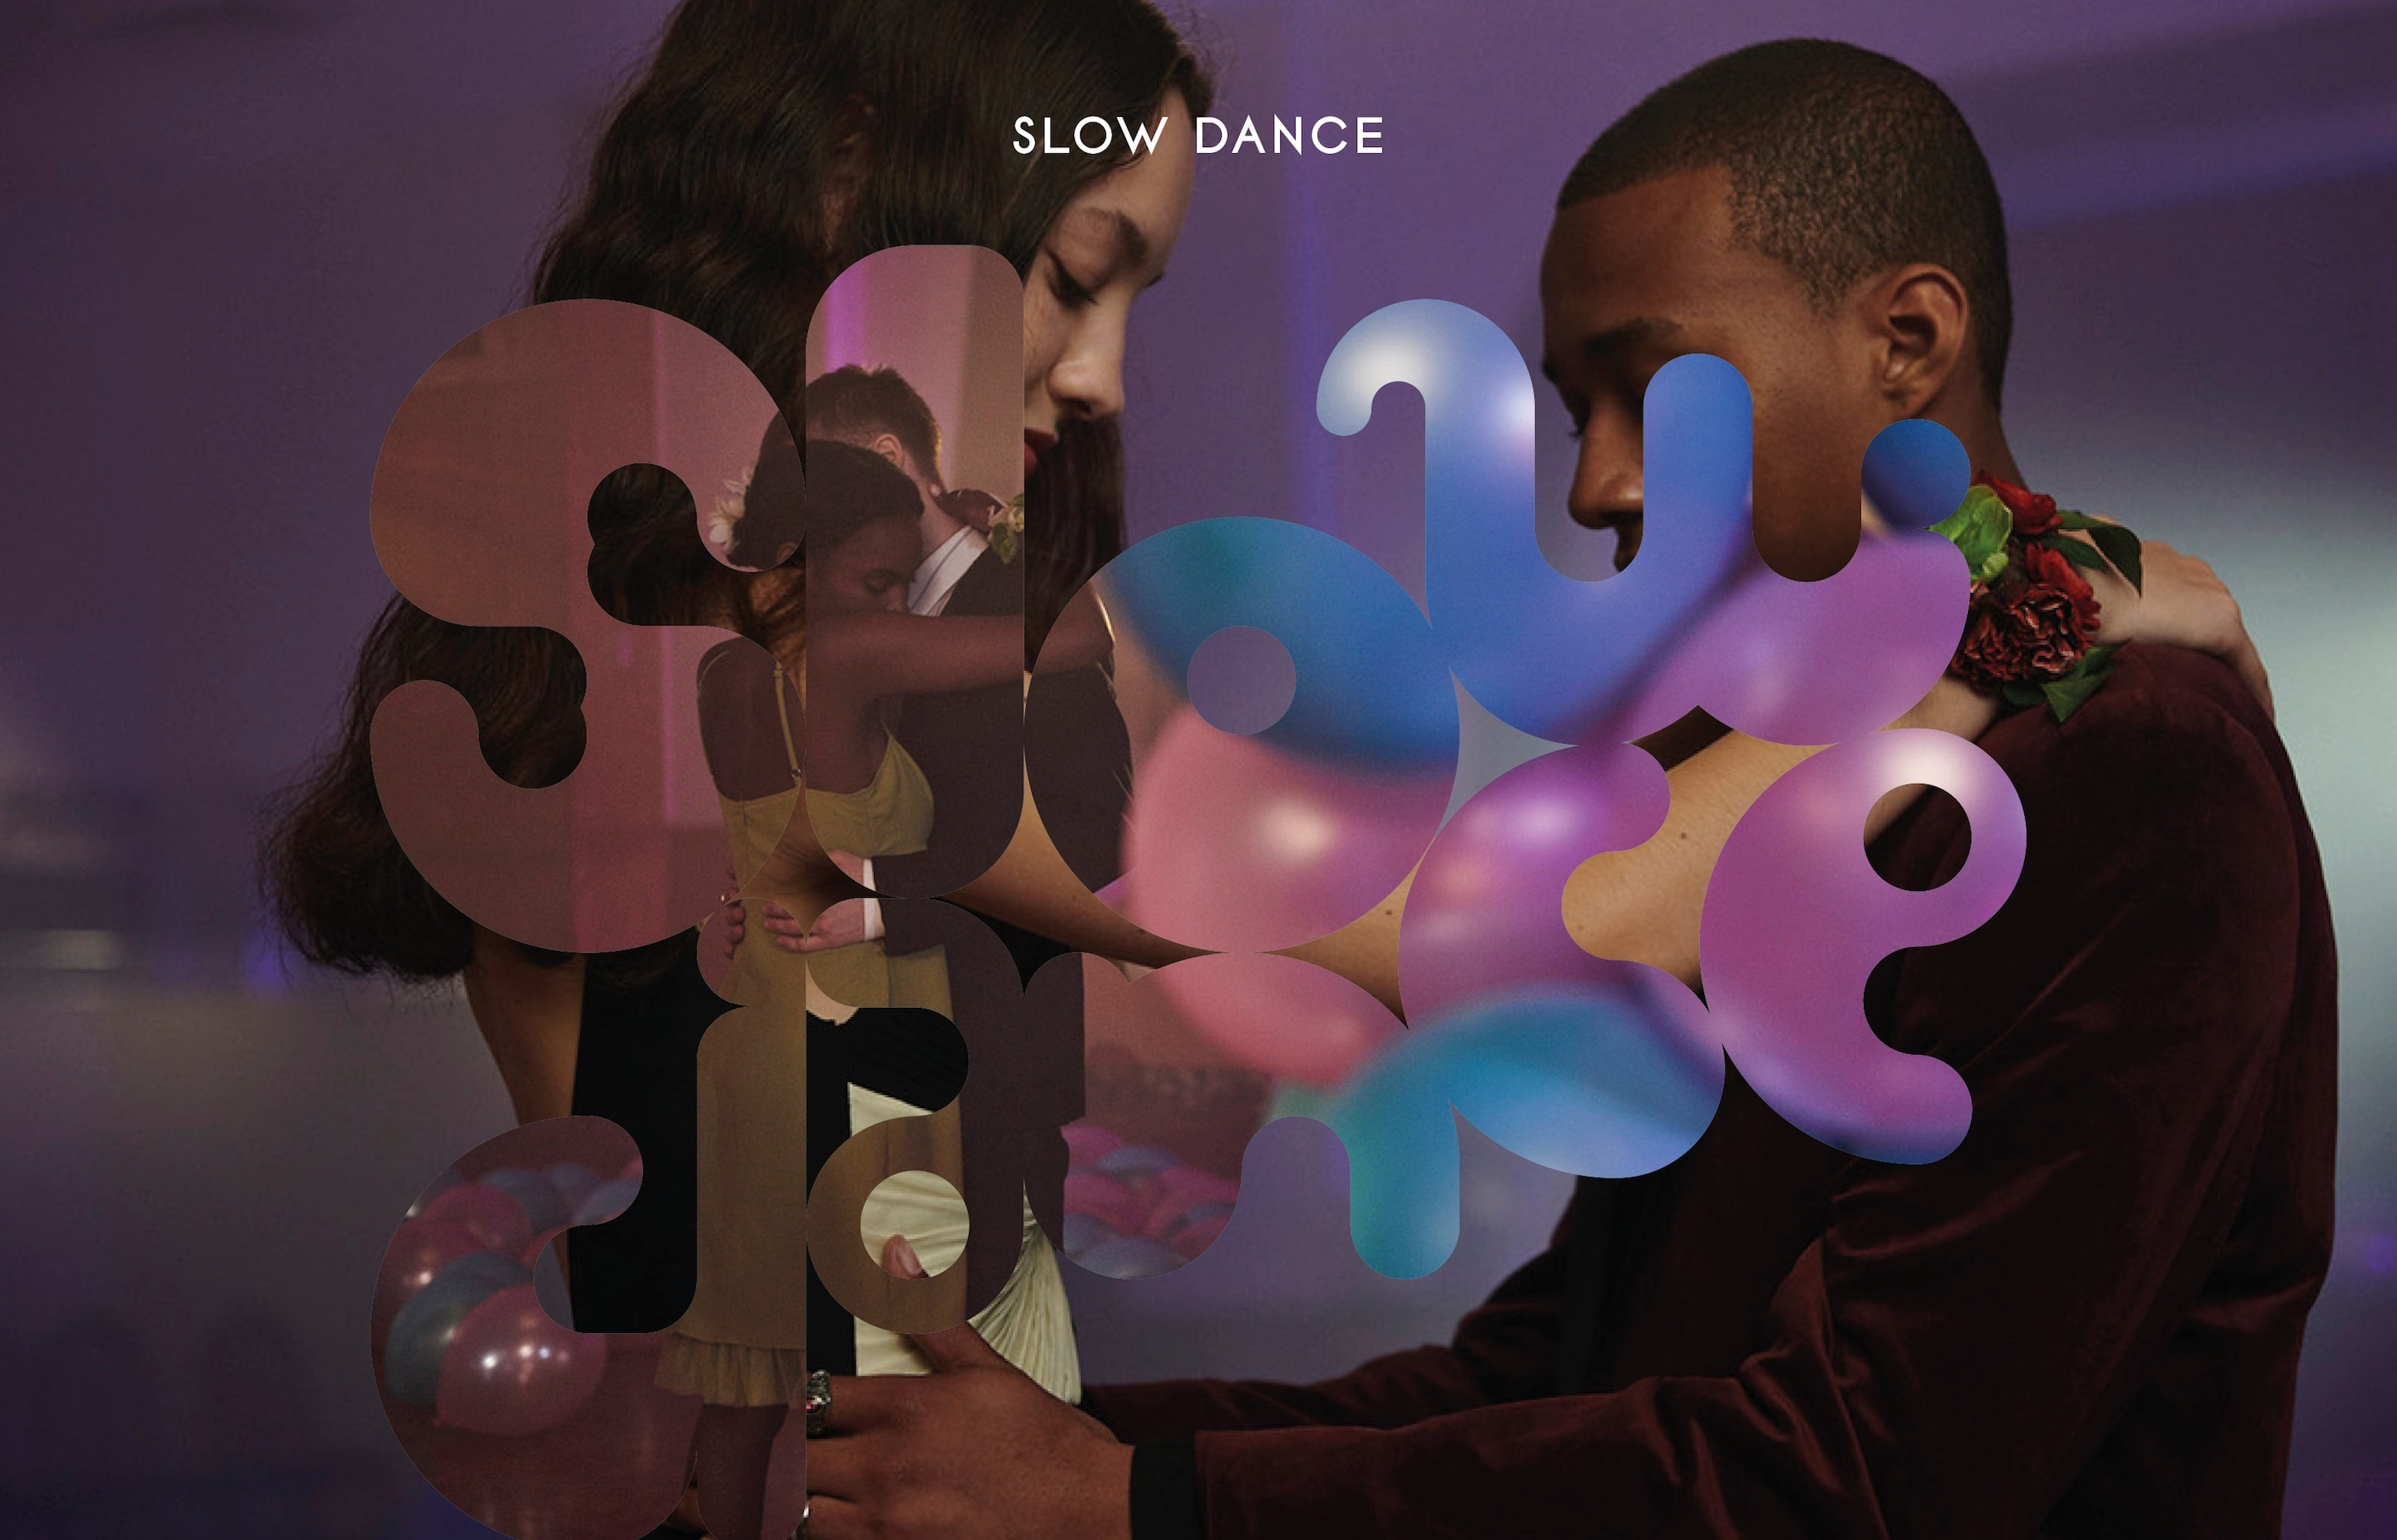 BYREDOの新作「SLOW DANCE」<br>夢のような思春期の思い出